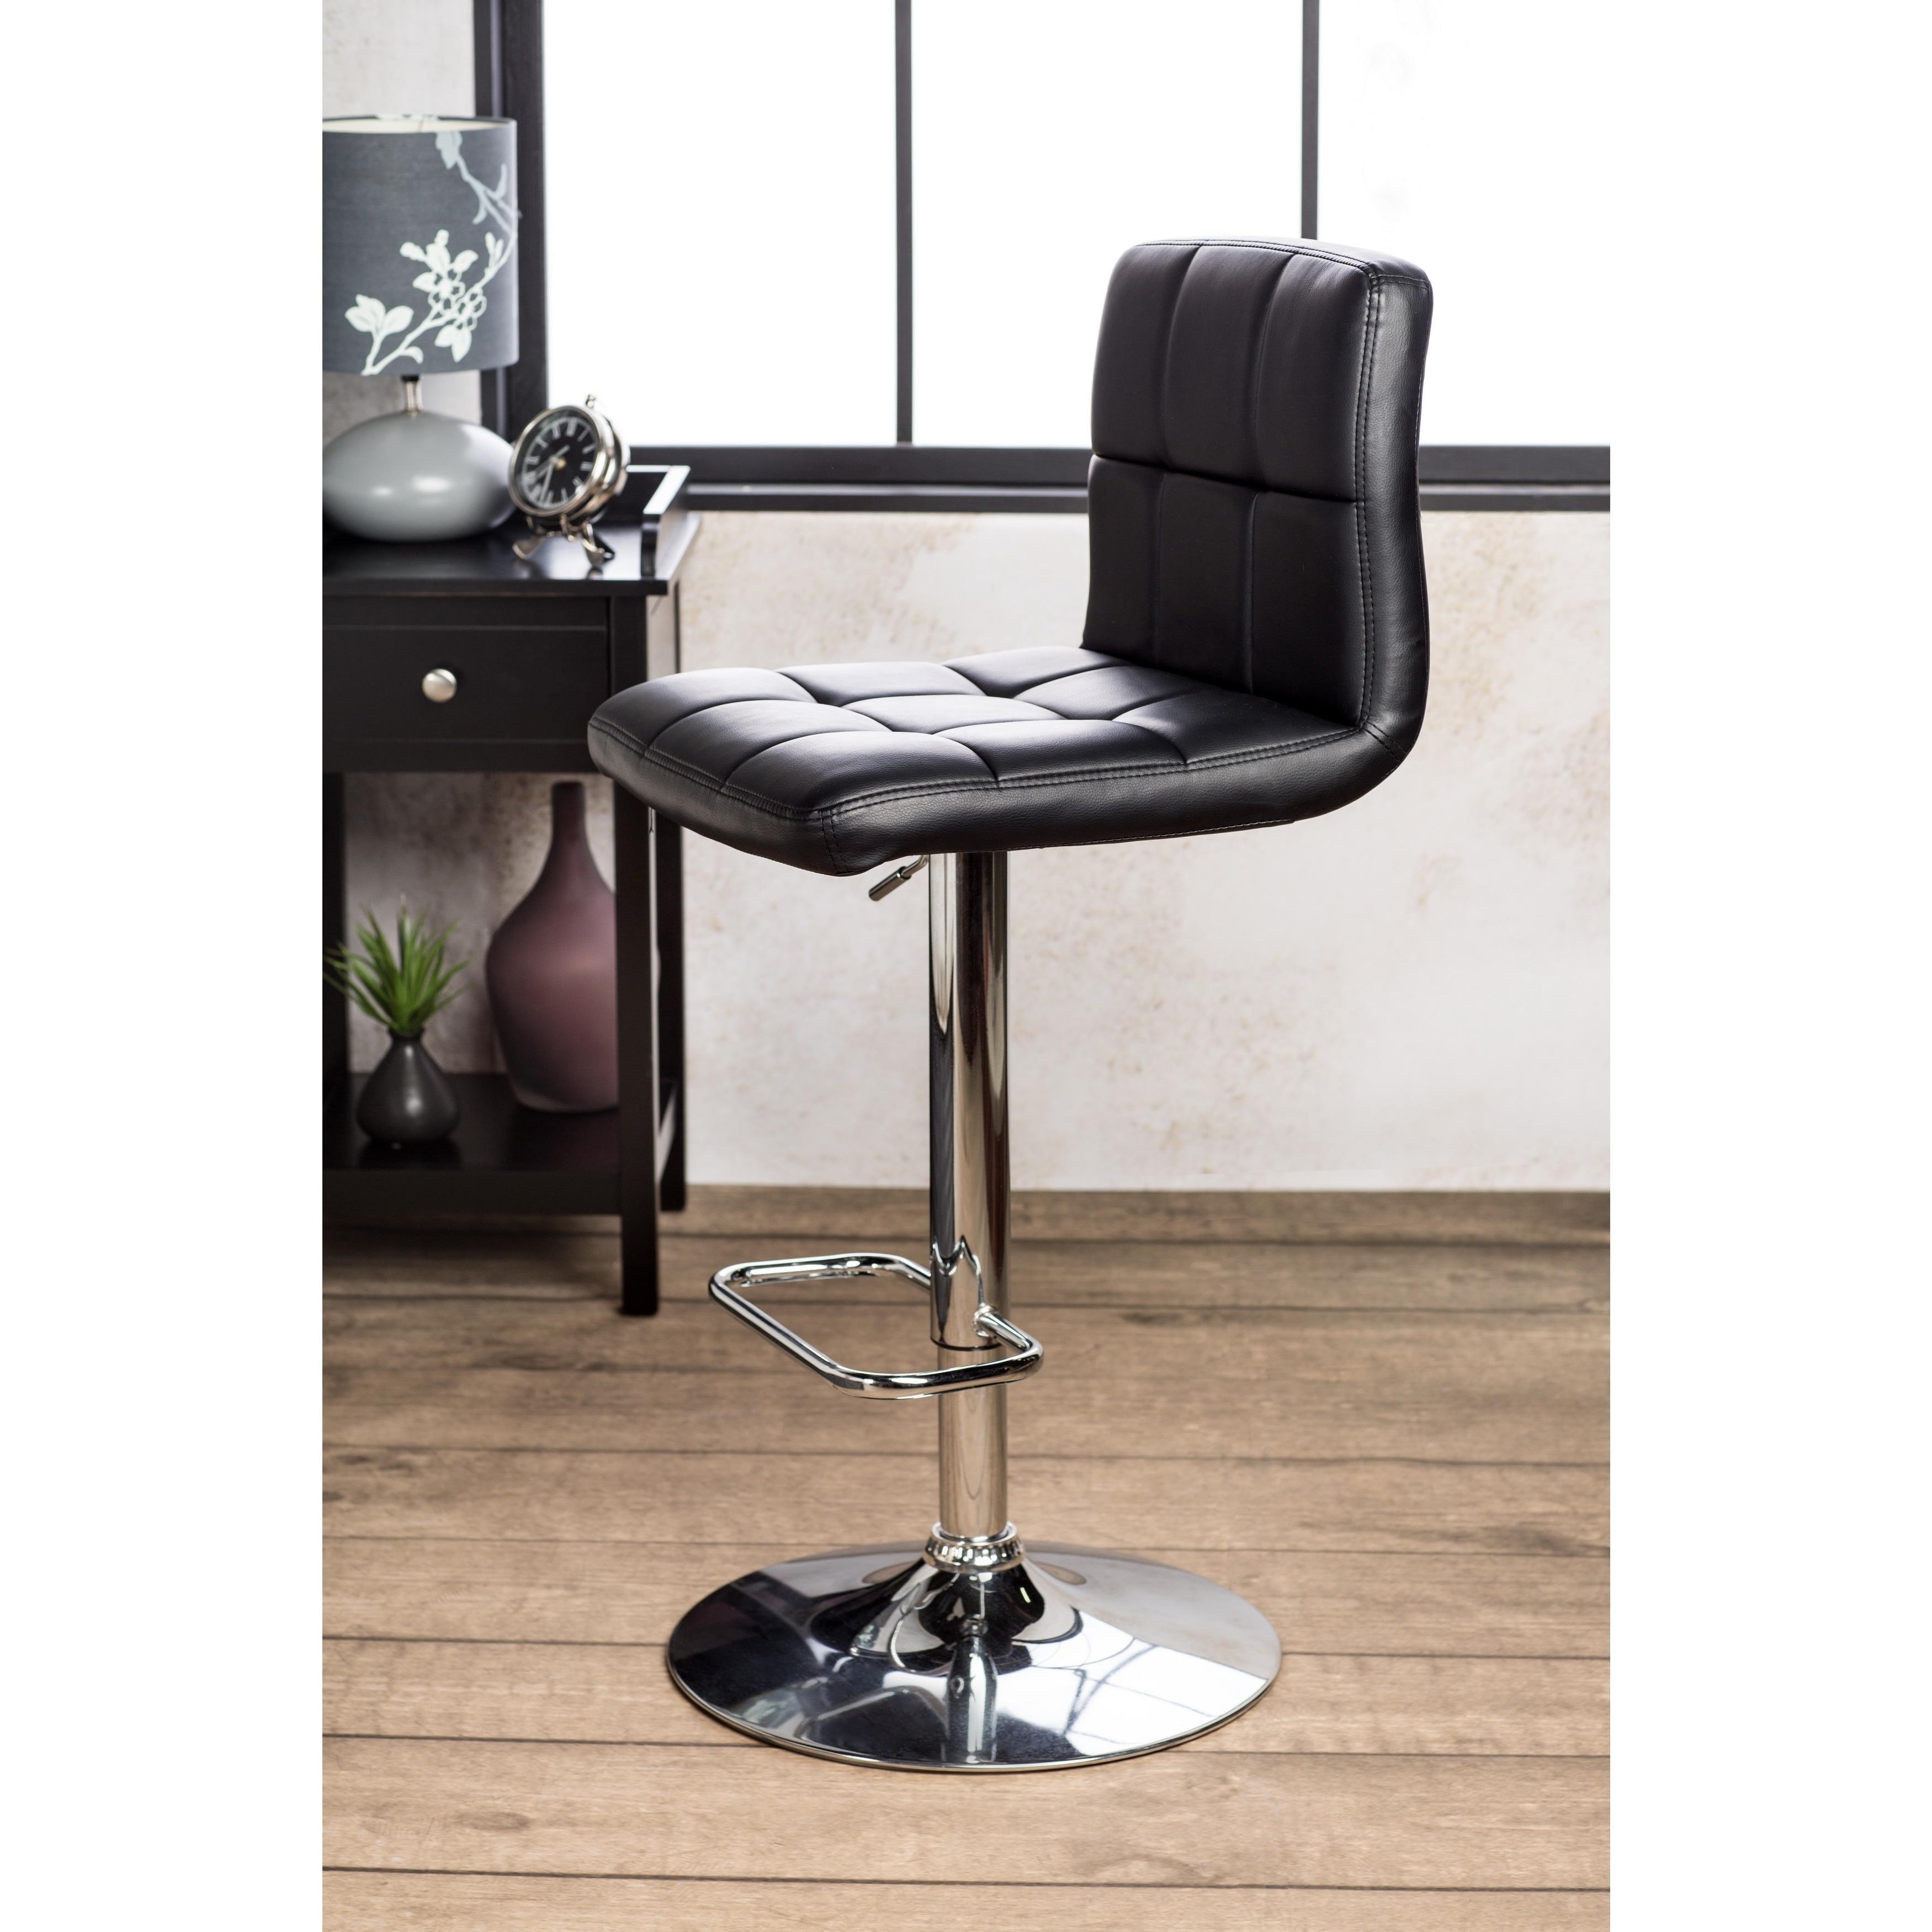 Furniture Of America The Comfy Doris Leatherette Bar Stool